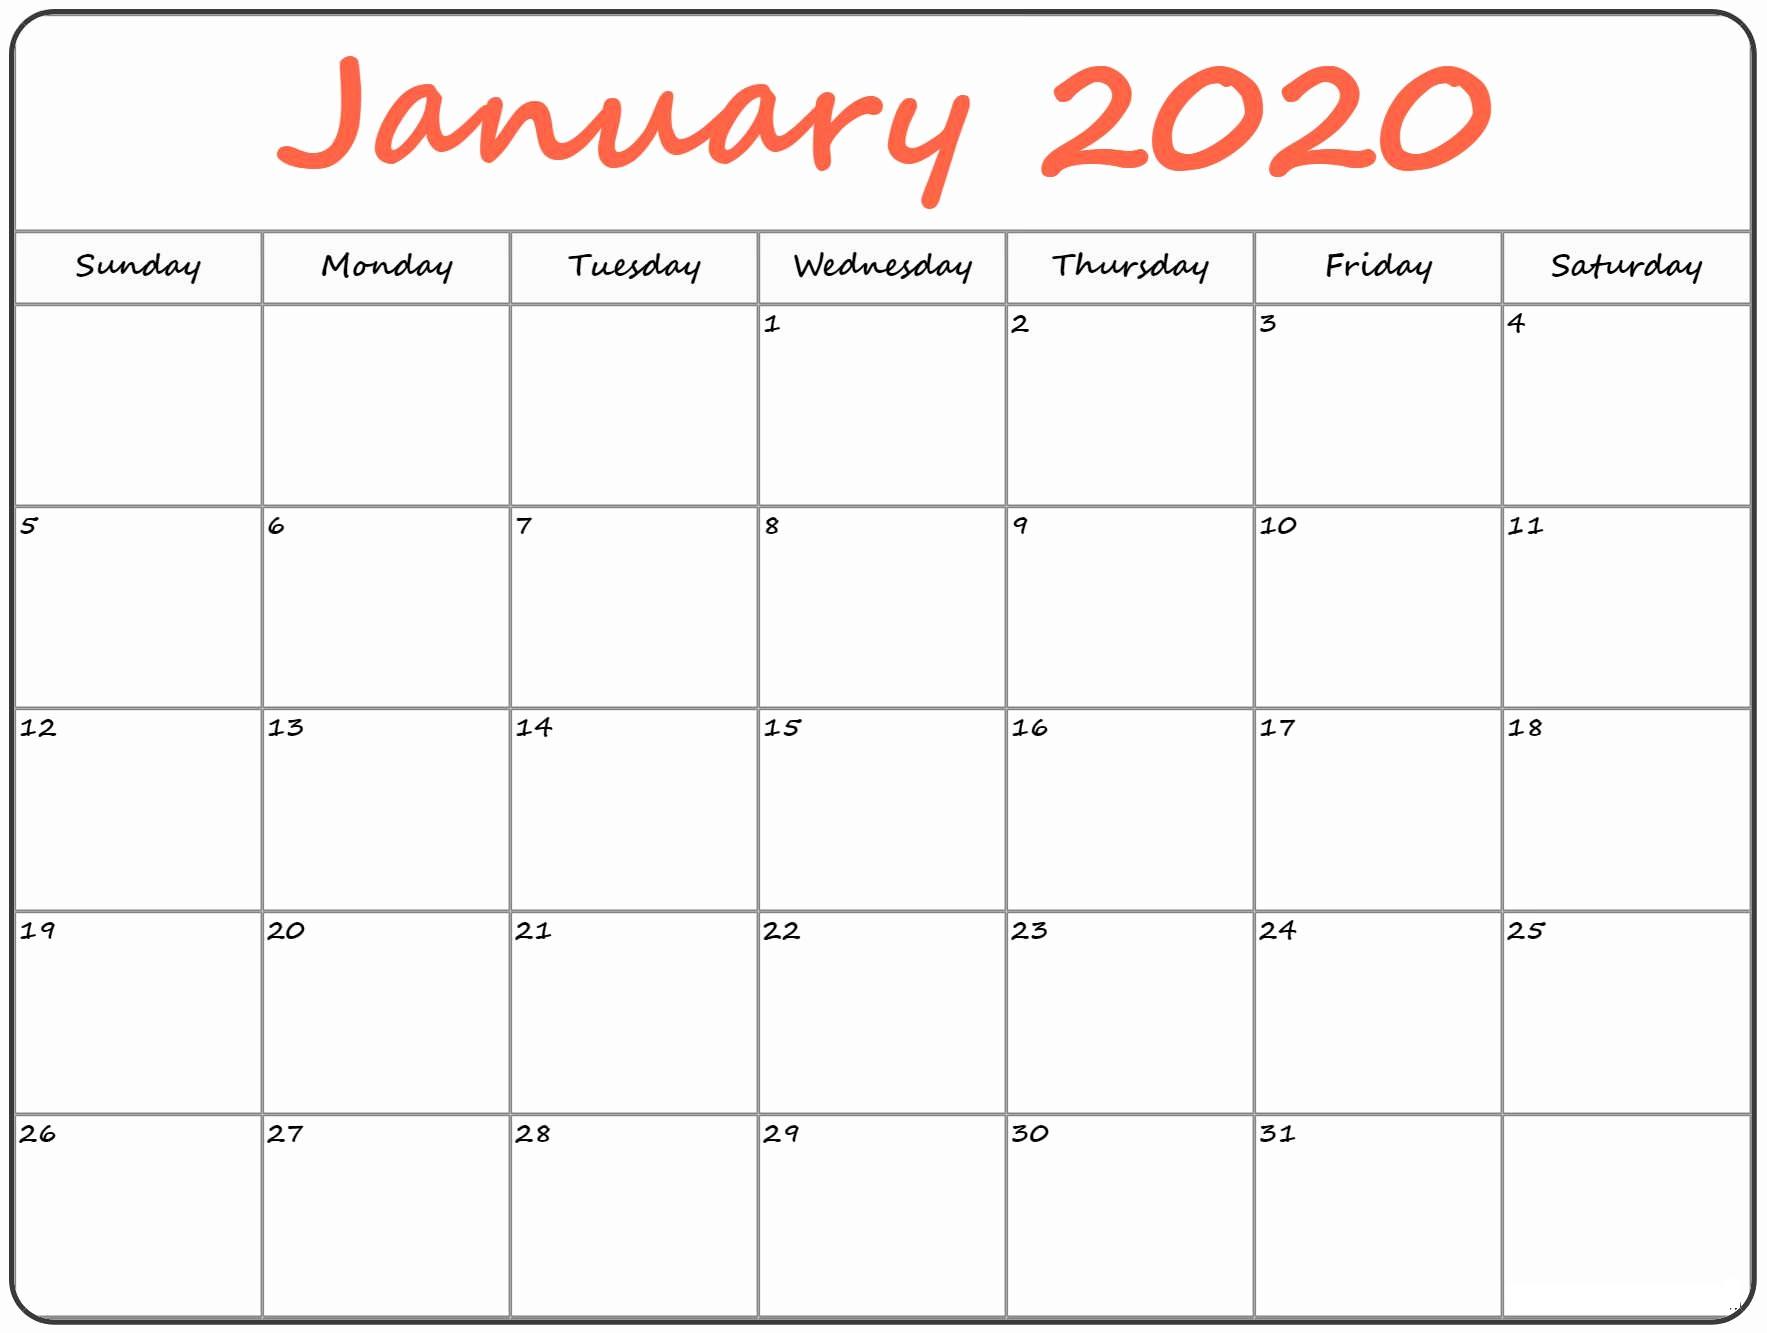 Cute January 2020 Calendar For Classroom Management | Free